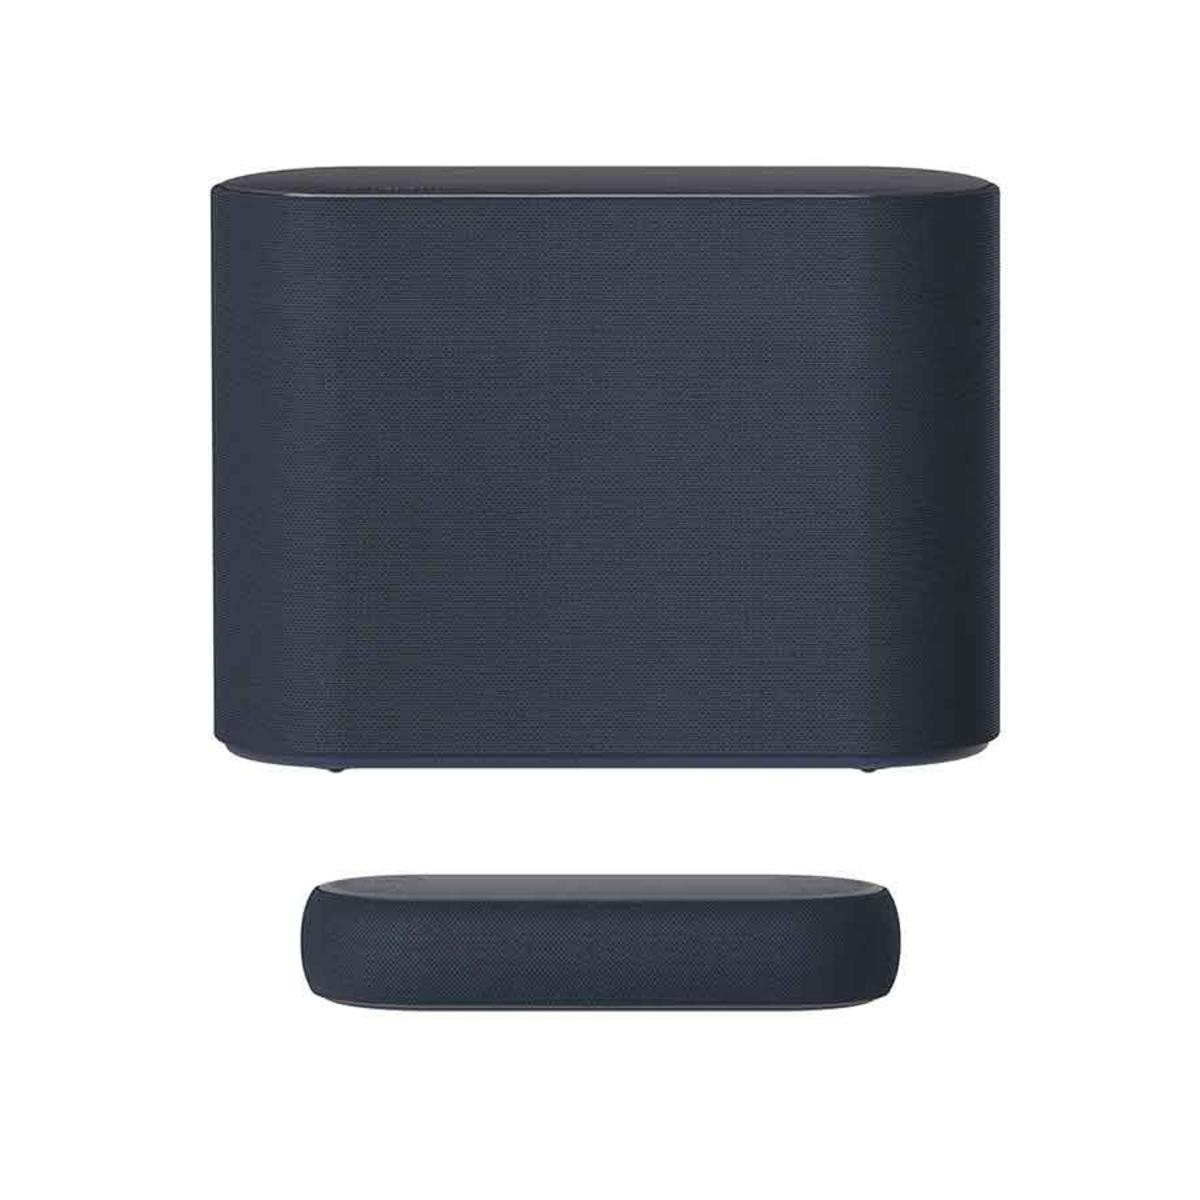 LG QP5 clair Dolby Atmos Soundbar System